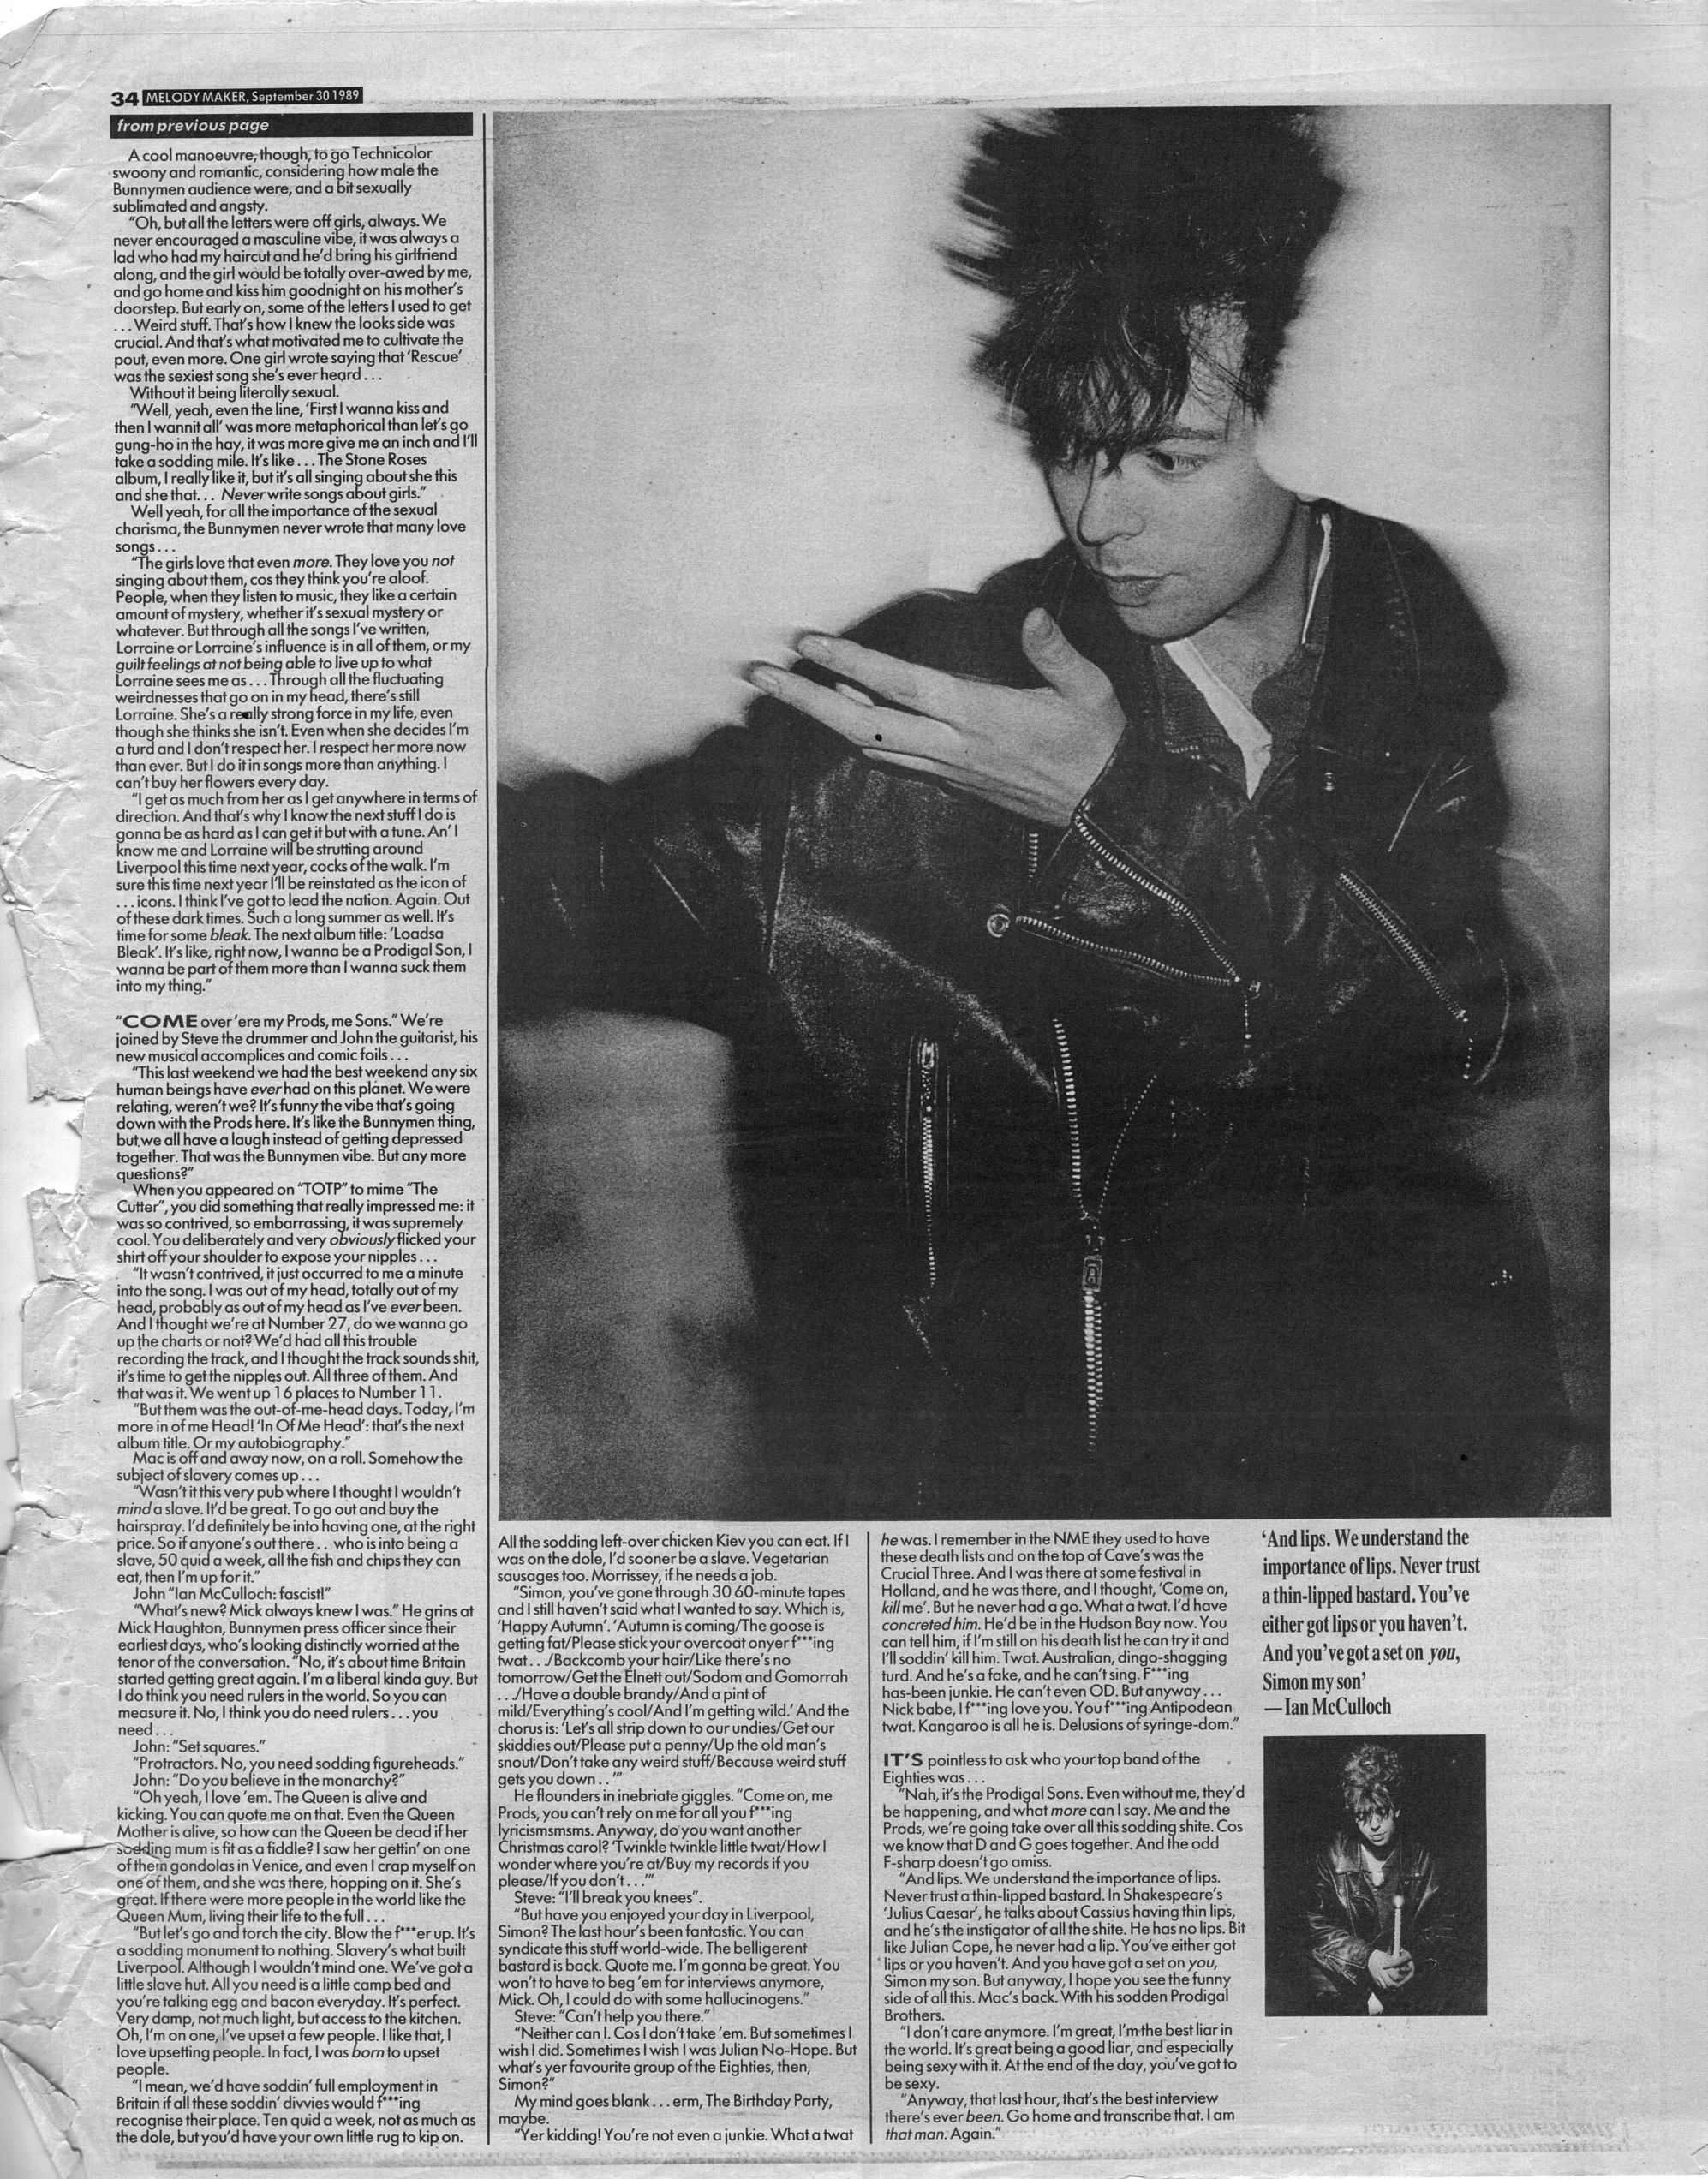 simon-reynolds-interviews-ian-mccolluch-part-2-30th-sept-1989